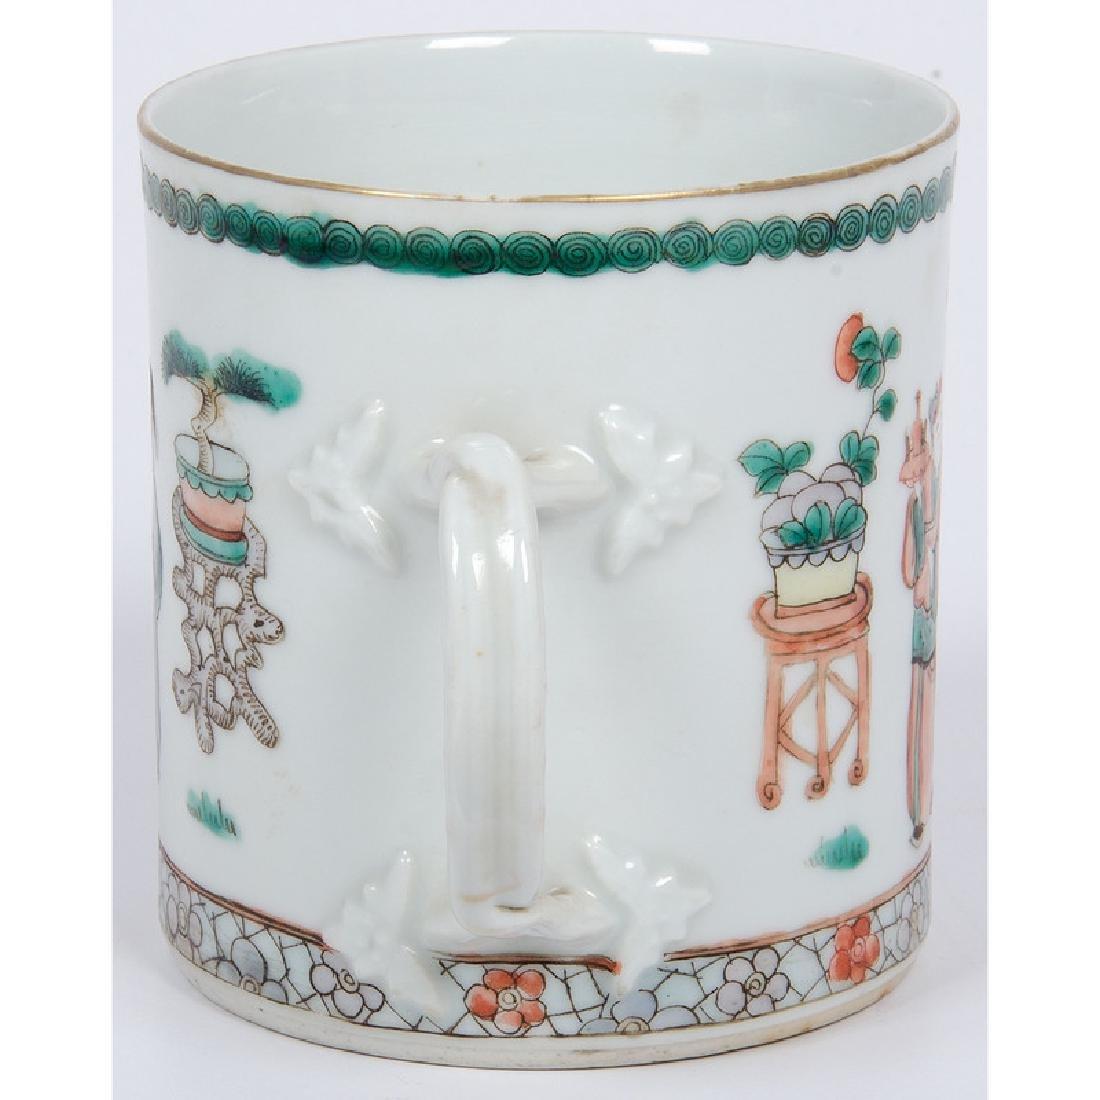 Chinese Export Mug and Plate - 4